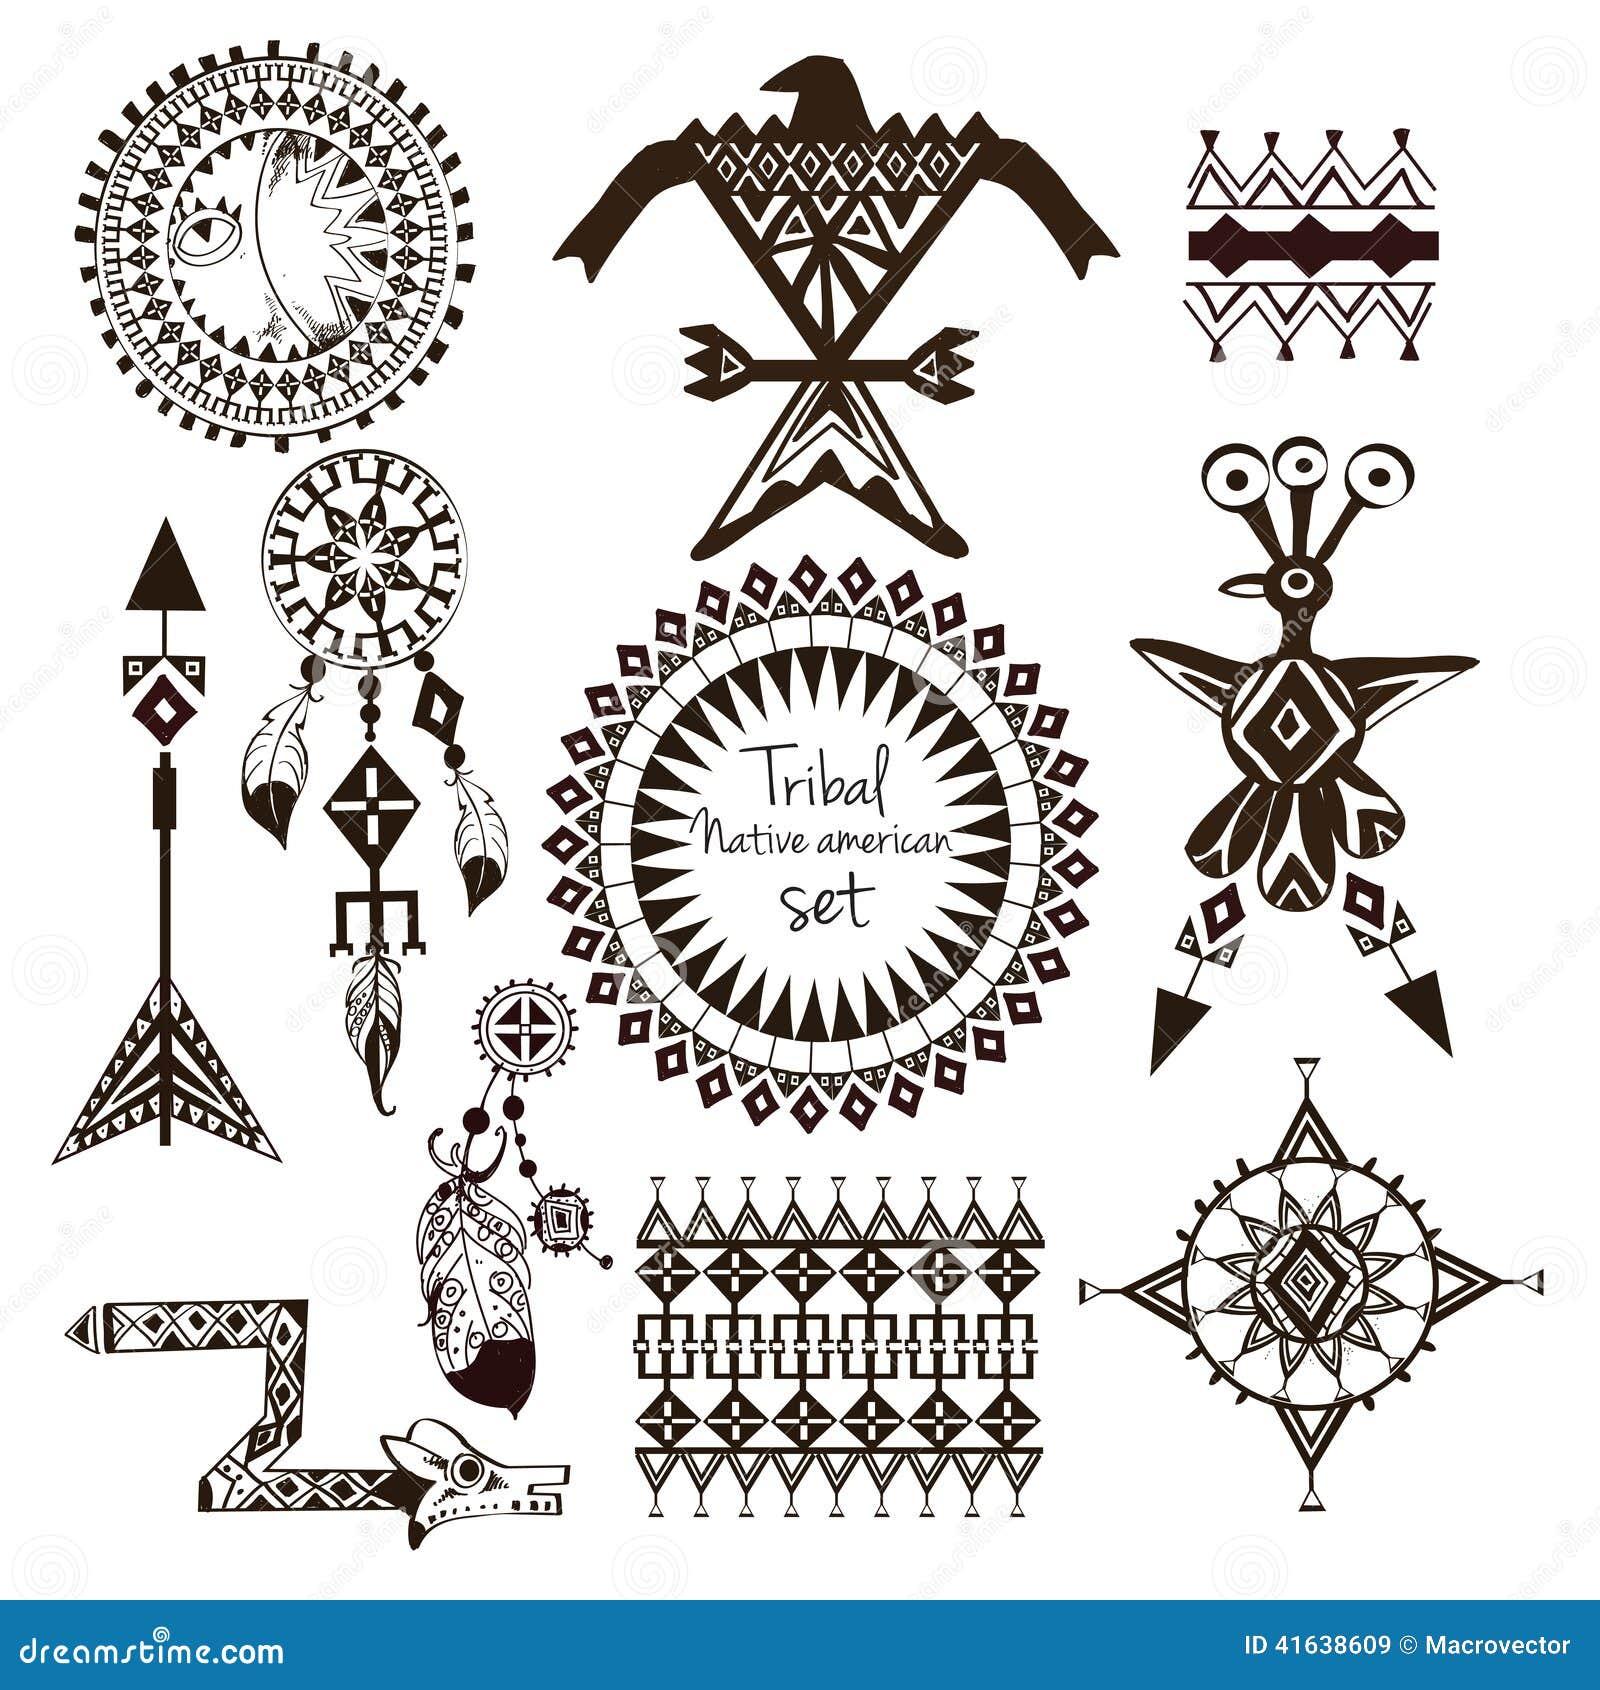 Tribal Native American Set Stock Vector - Image: 41638609